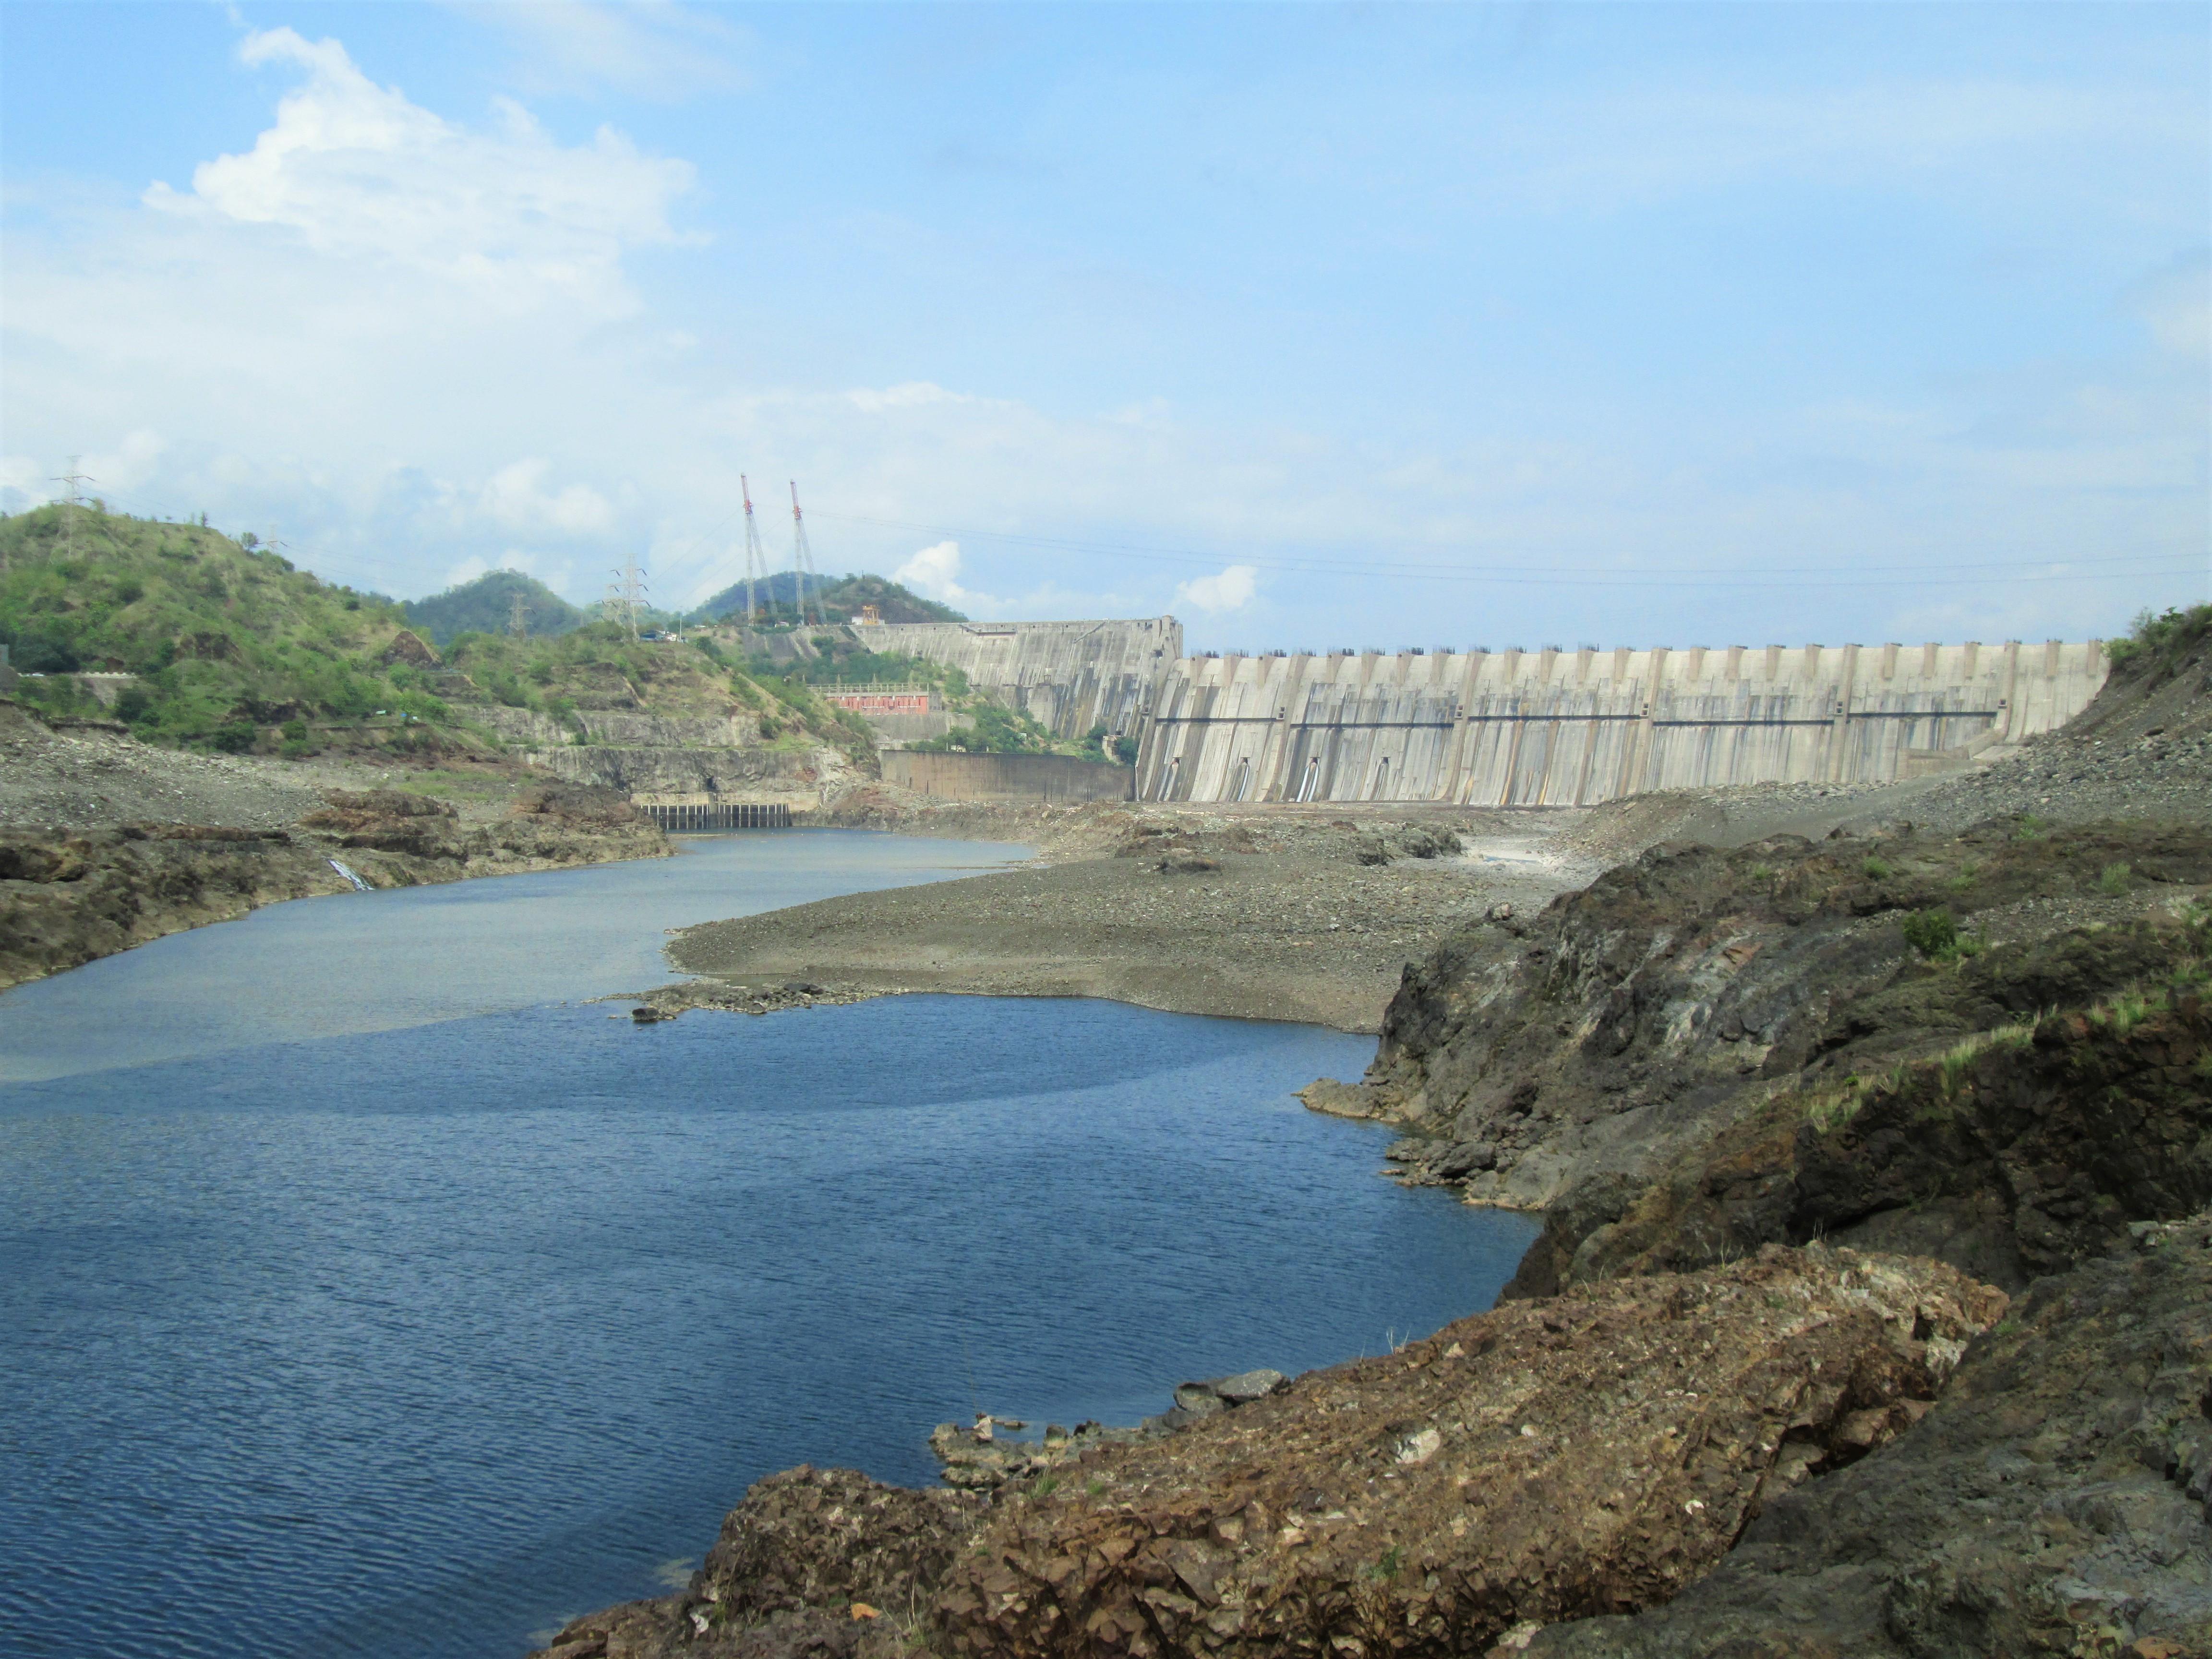 File:Narmada dam on River Narmada.jpg - Wikimedia Commons